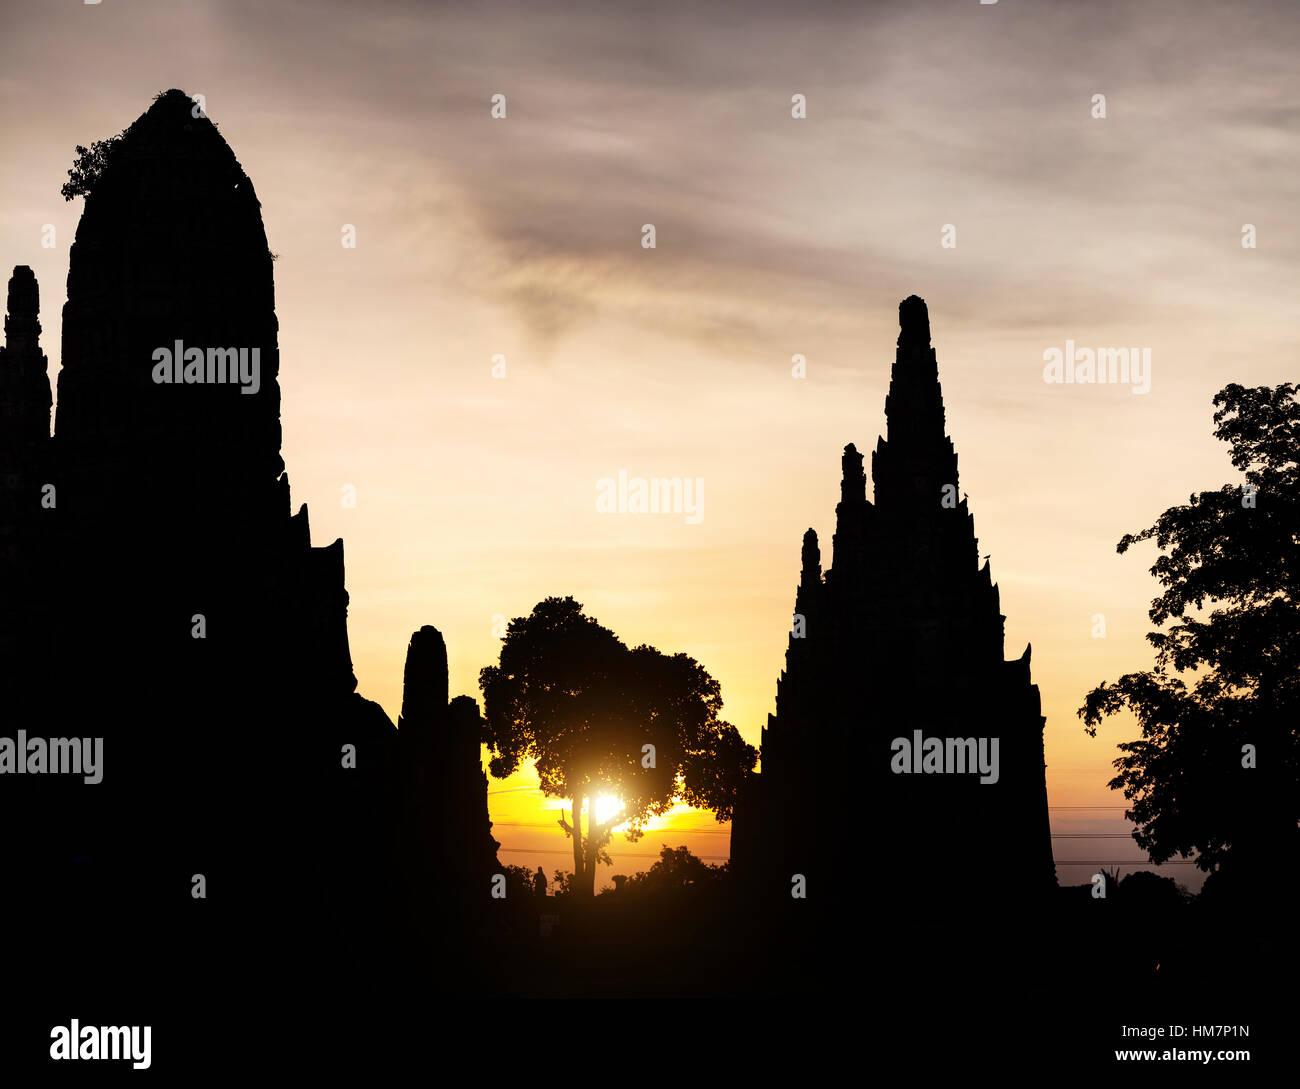 Silhouette of ancient ruined wat Chaiwatthanaram at sunset in Ayutthaya, Thailand - Stock Image